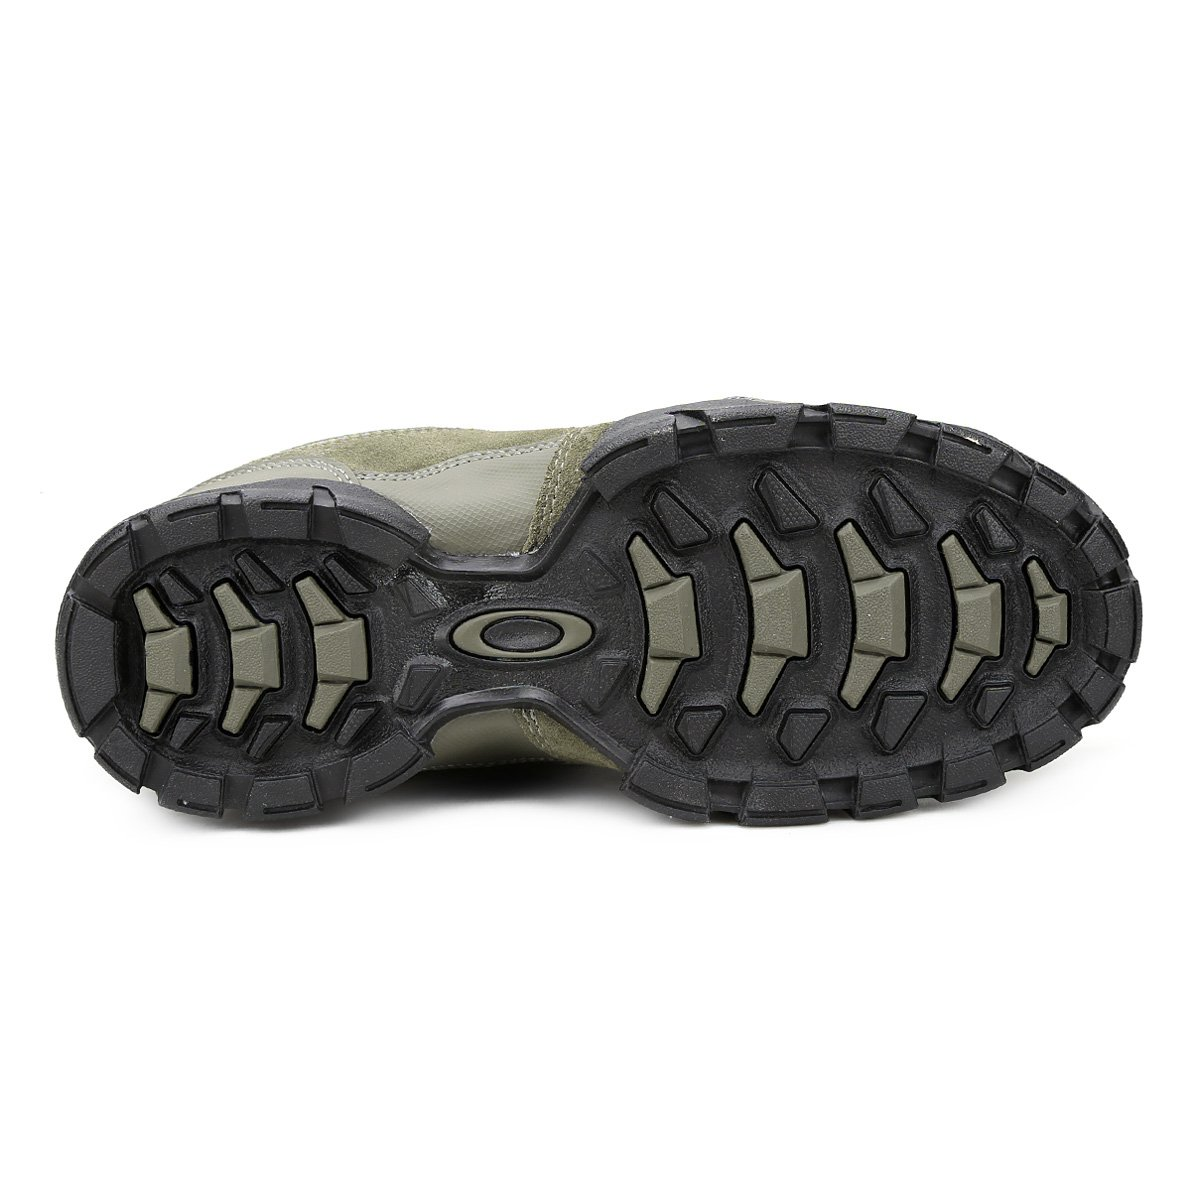 c0ca5e65eb7 Netshoes  Tênis Oakley Modoc Masculino - Verde - R 265